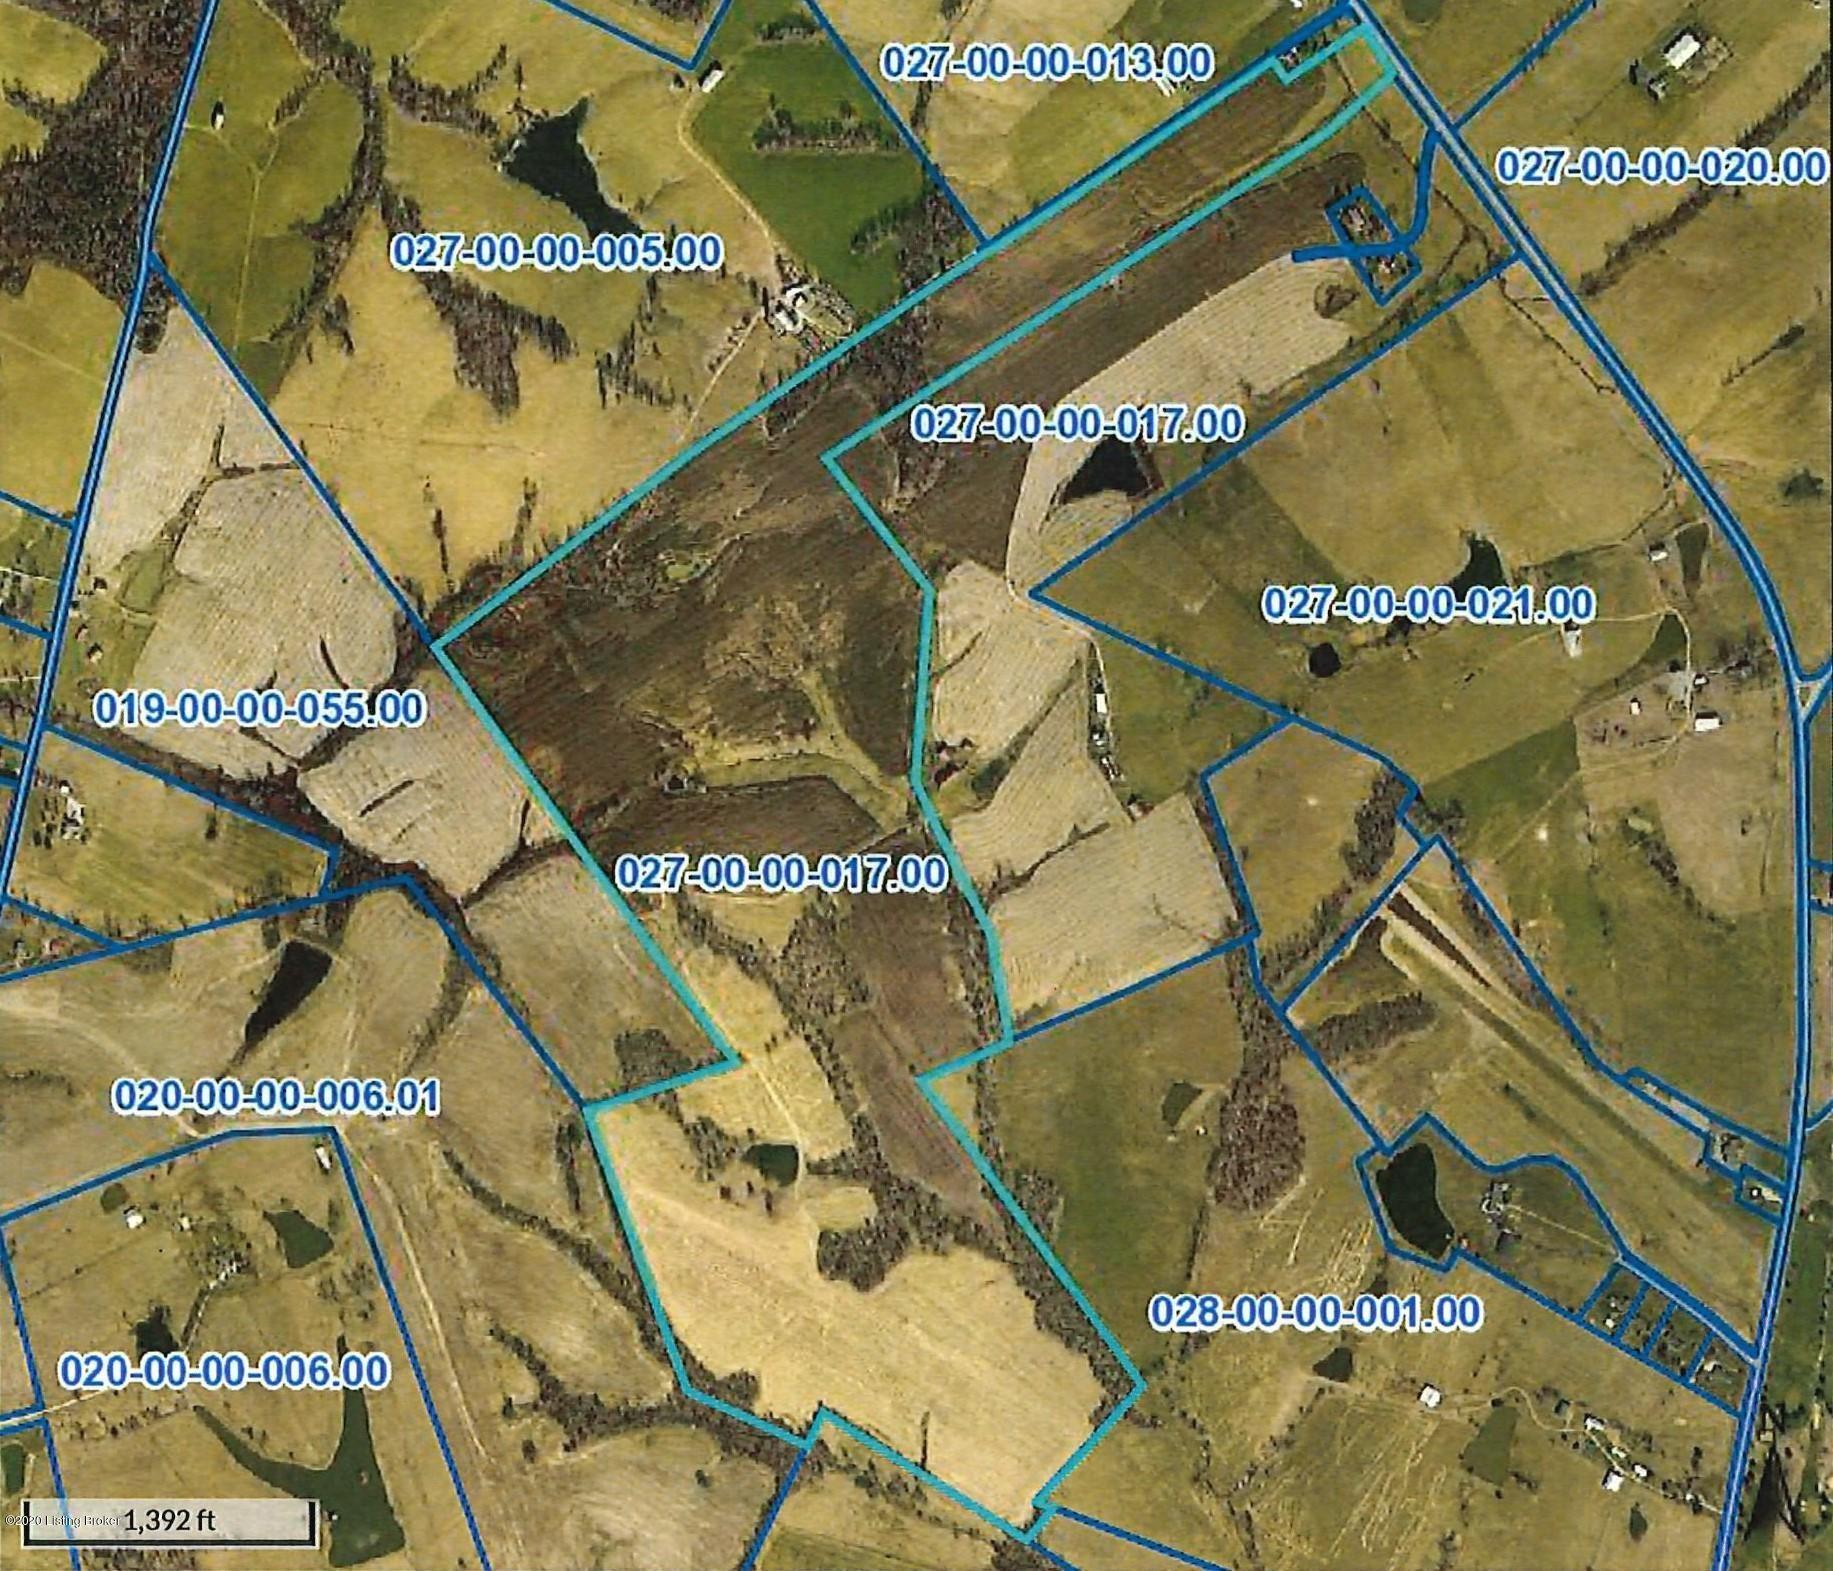 Property Image Of 0 Campbellsburg Rd In Campbellsburg, Ky